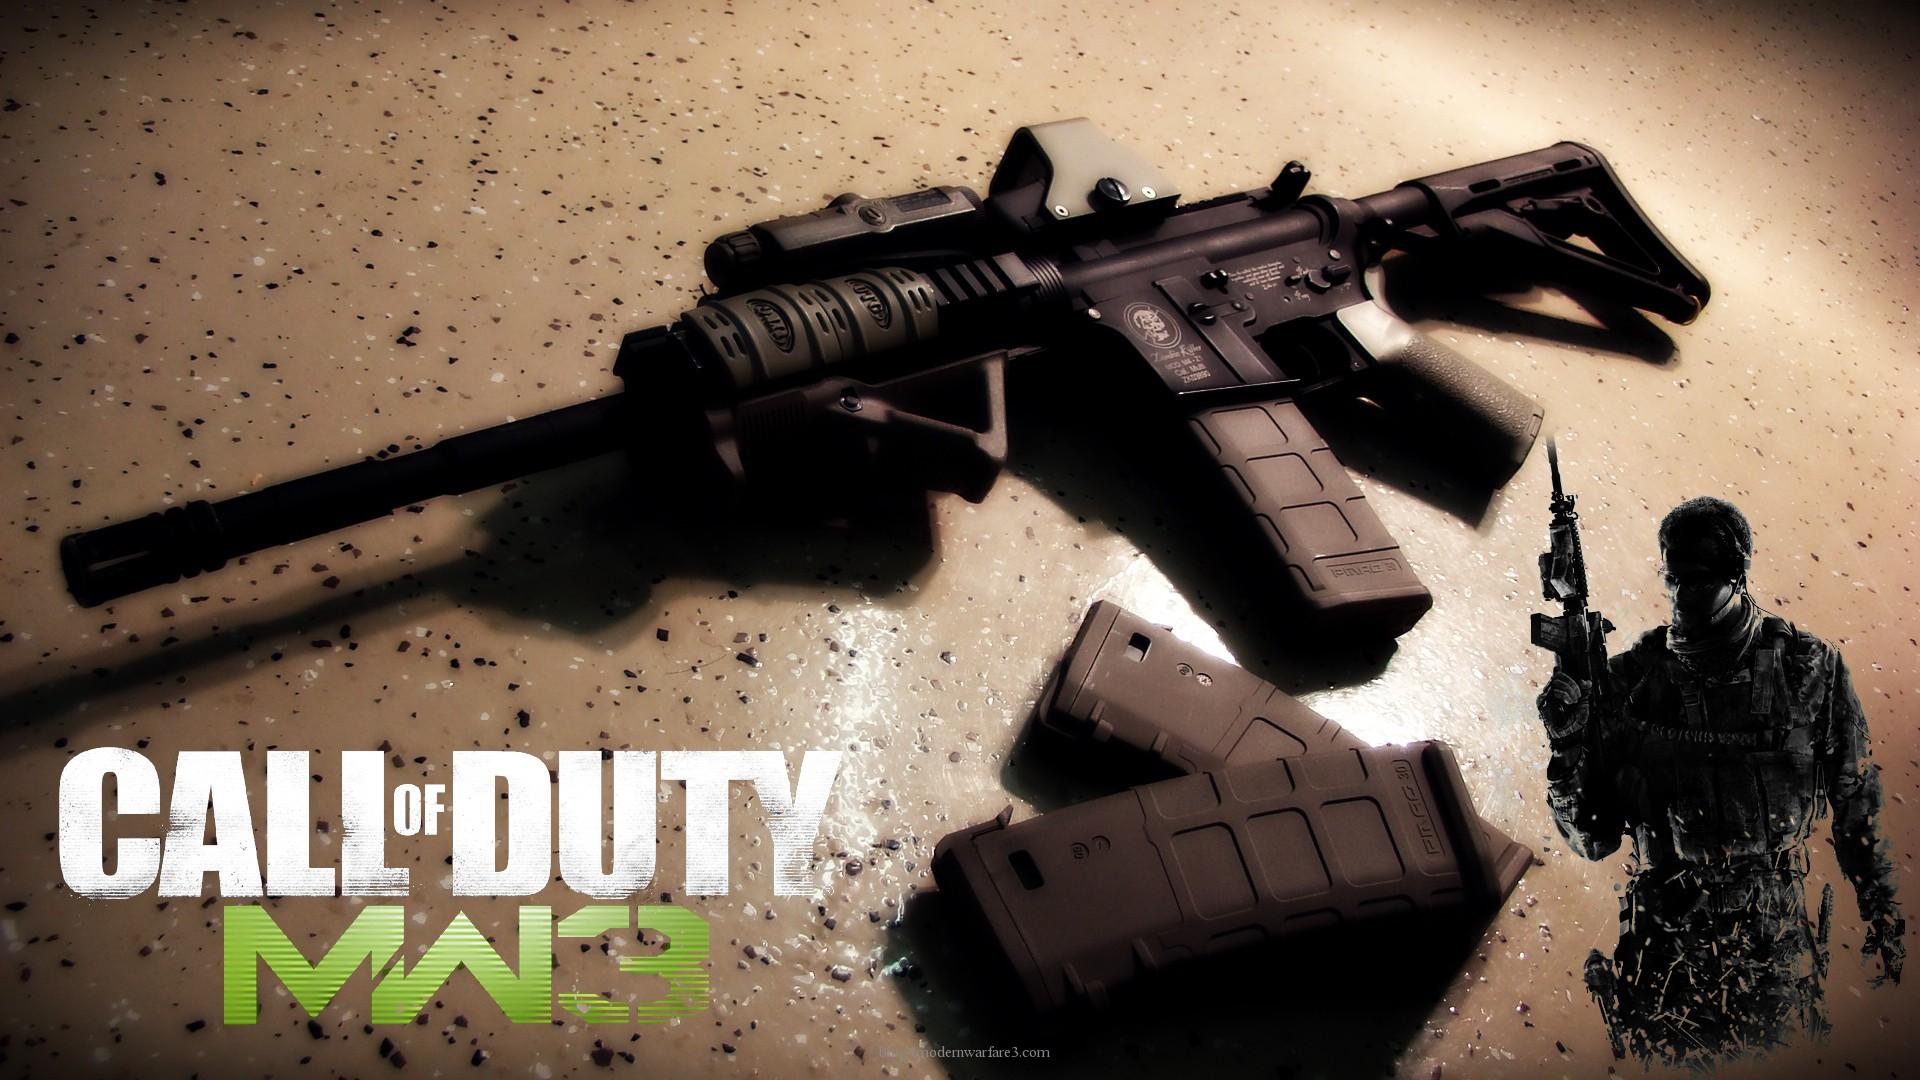 Free Download Call Of Duty Modern Warfare 3 Hd Wallpaper Games